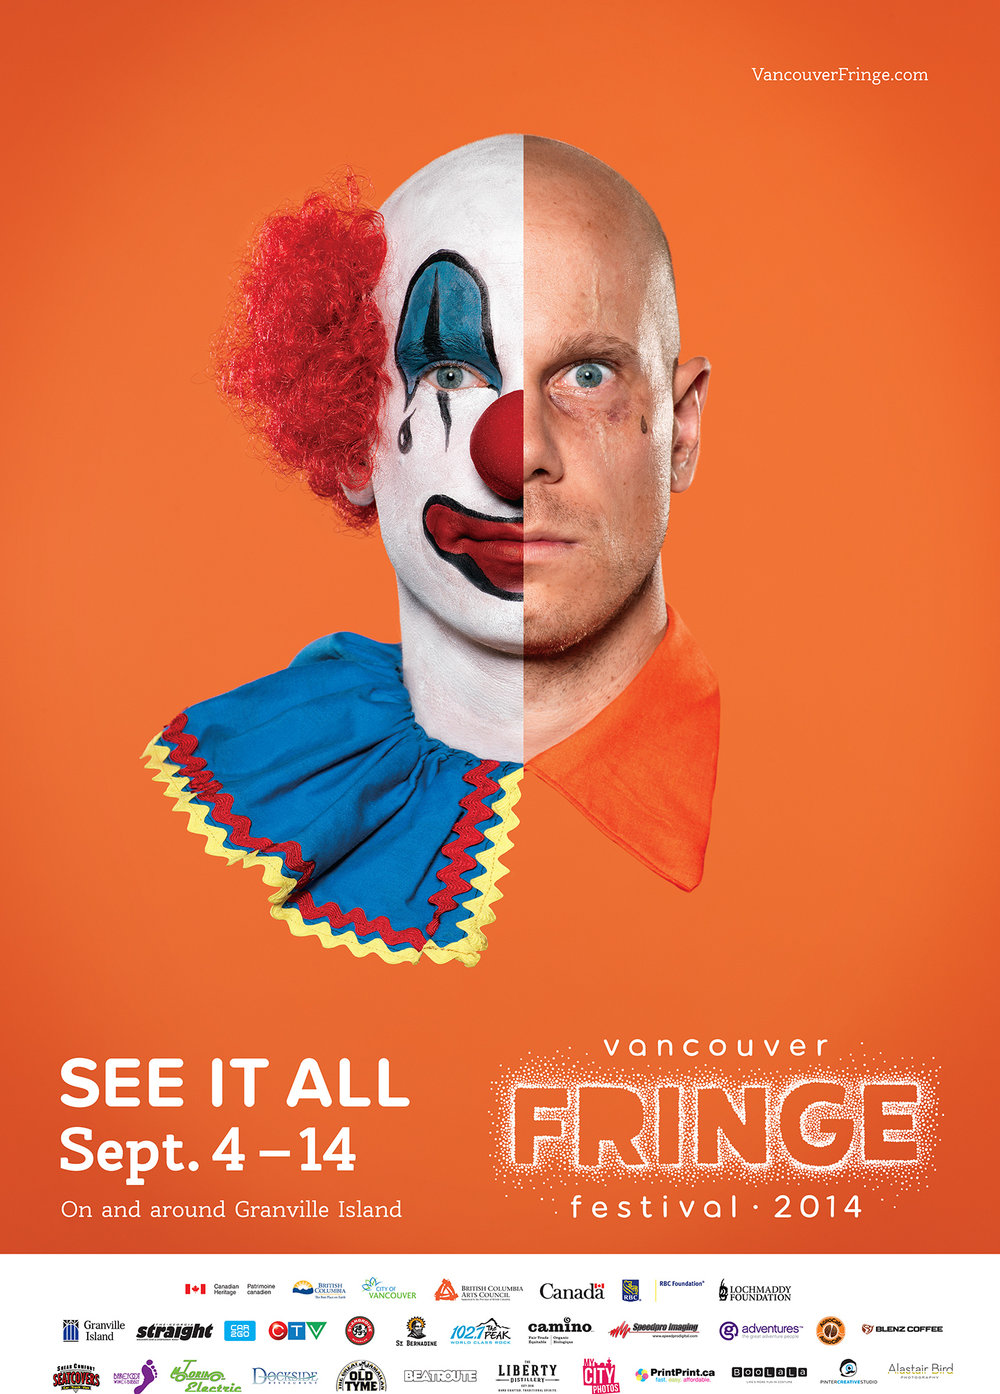 FringeFest_TSA_ClownCriminal.jpg